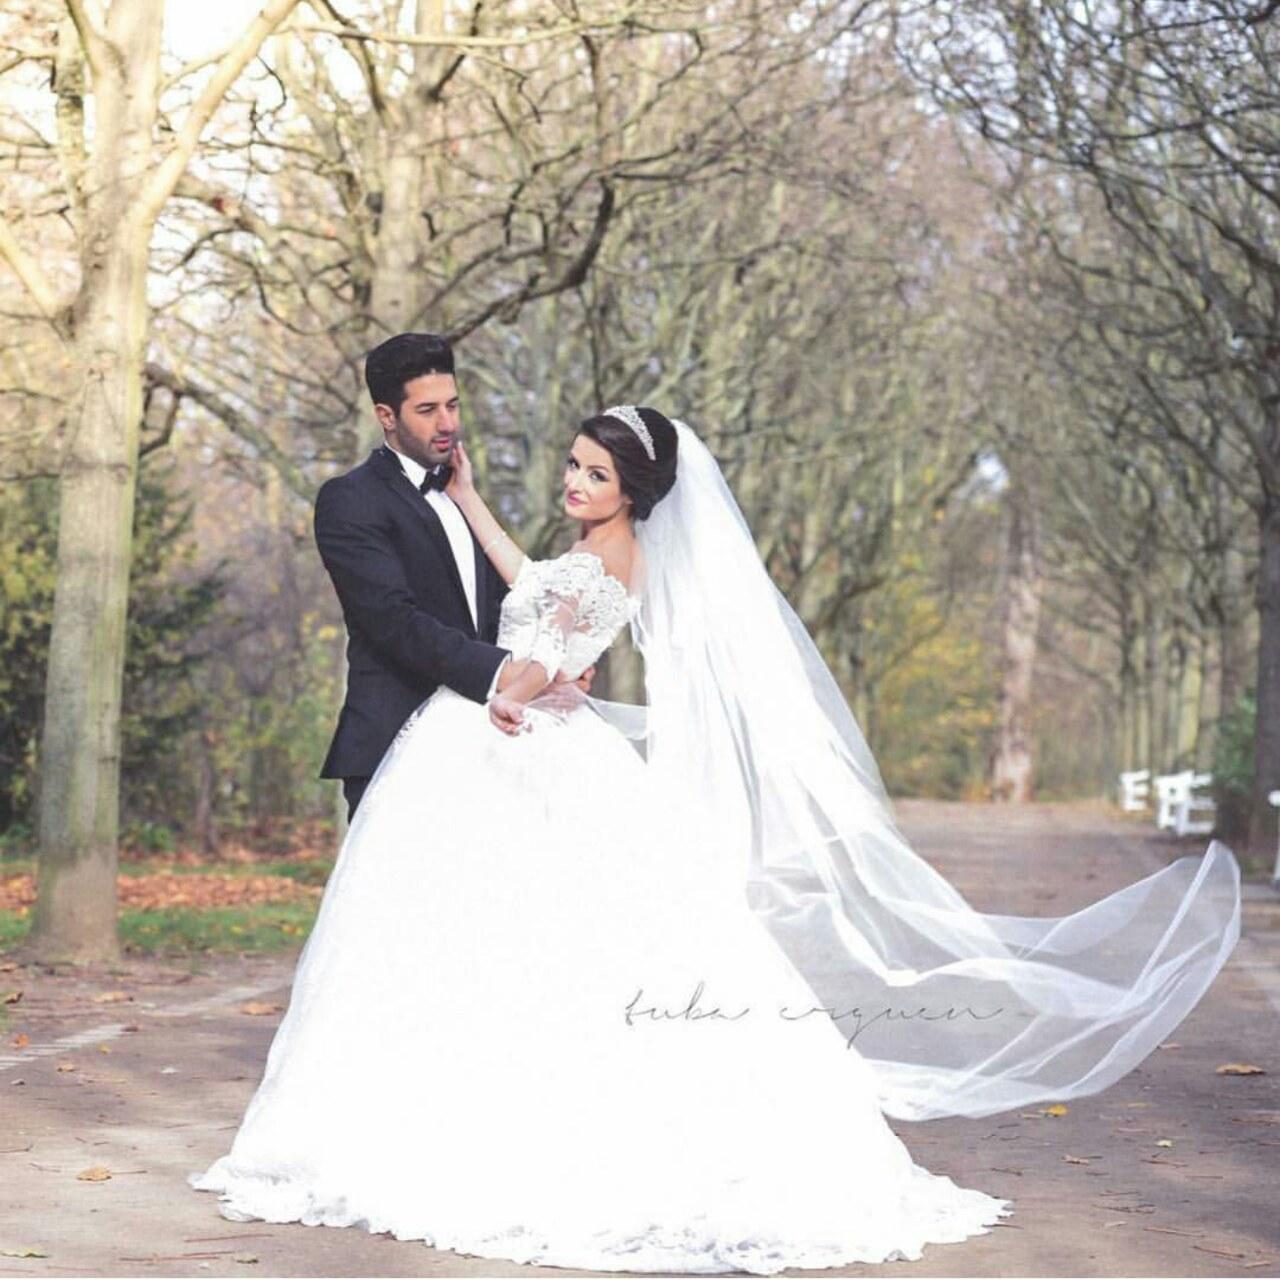 بالصور رمزيات عروس , رمزيات عروس كيوت جديده 3642 3